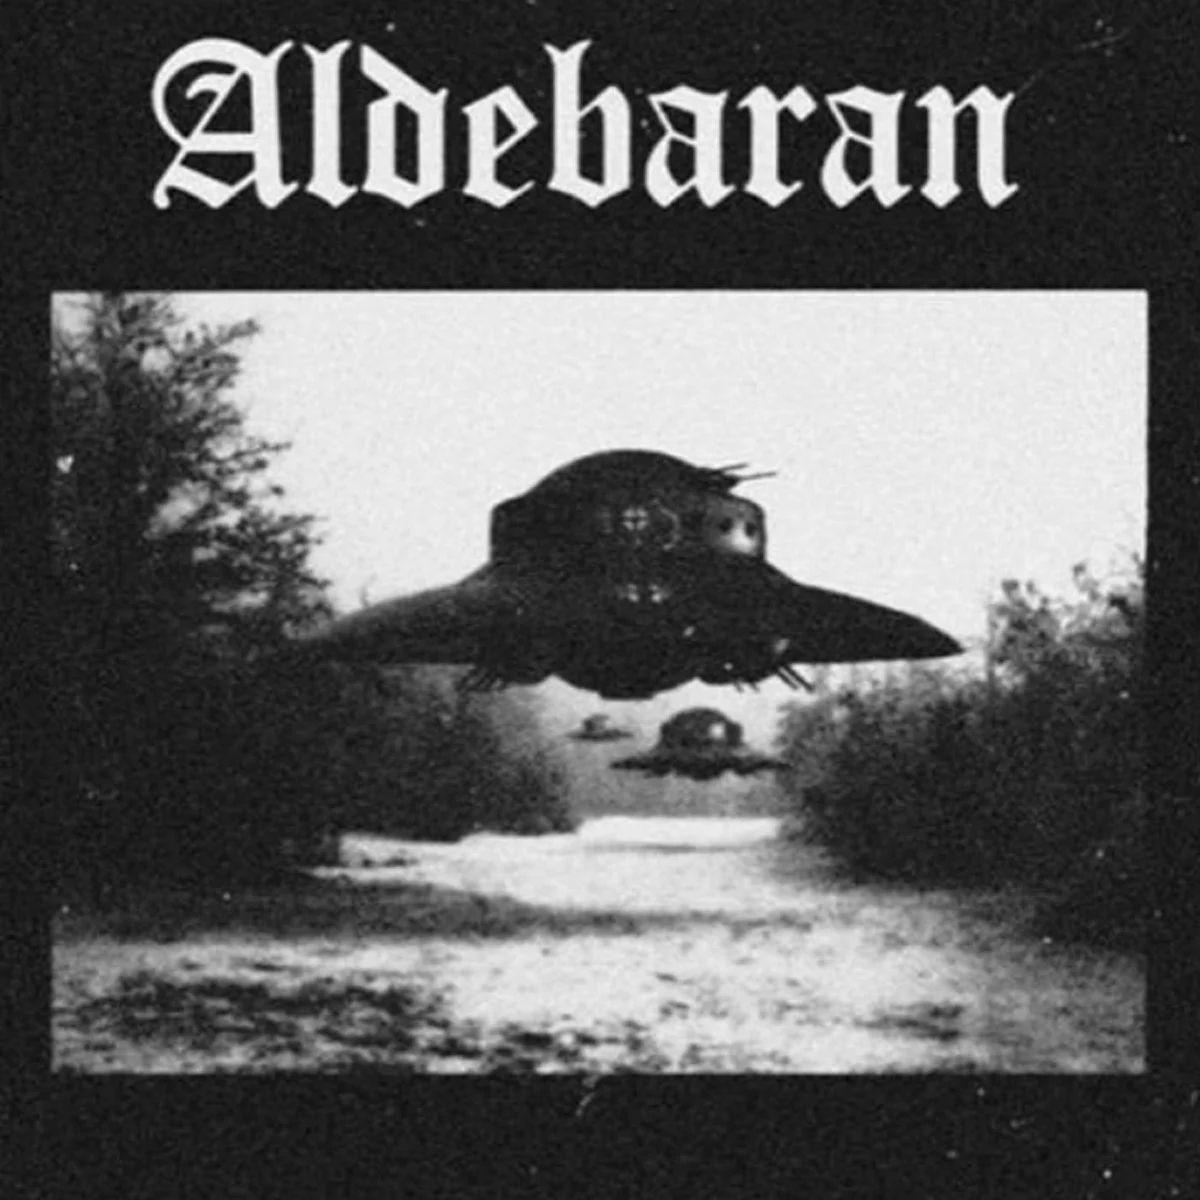 Review for Aldebaran (SWE) - Rymdfärd Mot Intet